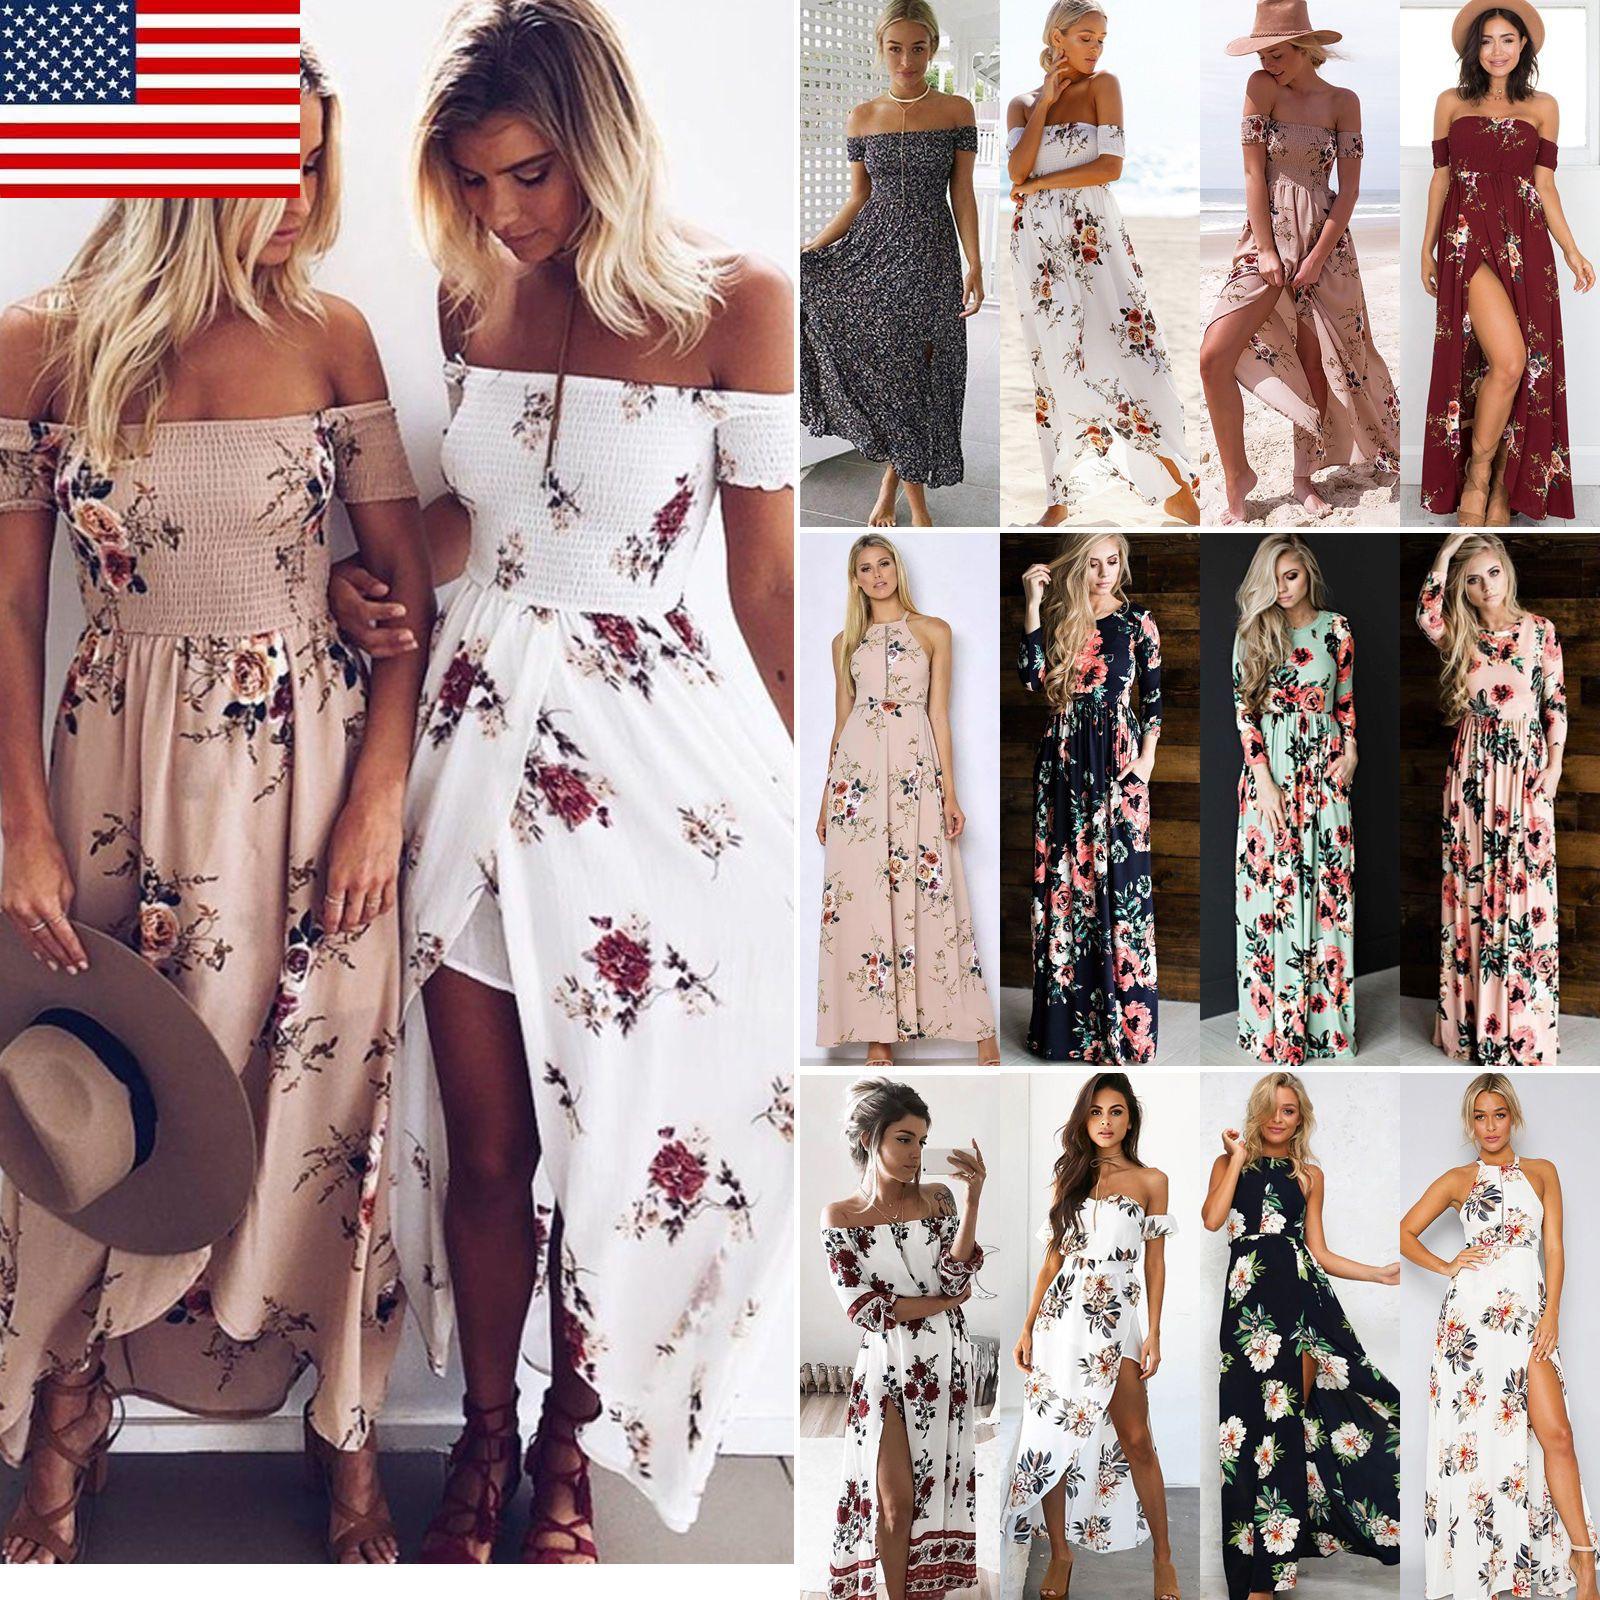 3a93524828eb US Women Boho Long Maxi Dress Floral Vintage Summer Evening Party Beach  Sundress